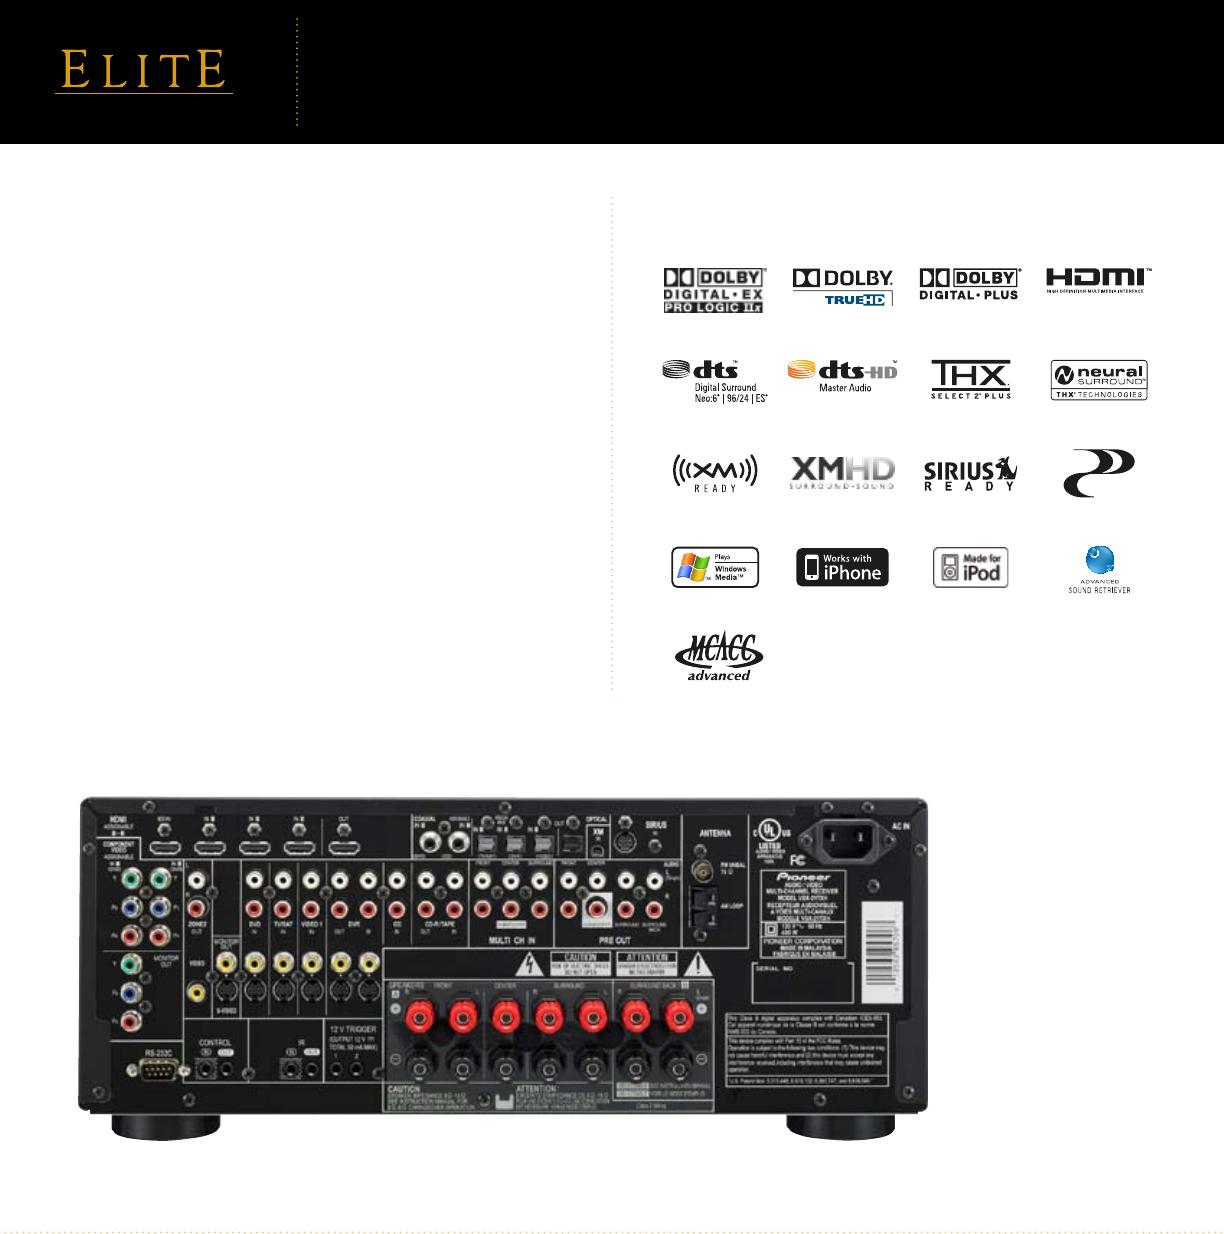 Vsx21txh manual av receivers array pioneer elite vsx 21txh users manual rh usermanual wiki fandeluxe Gallery